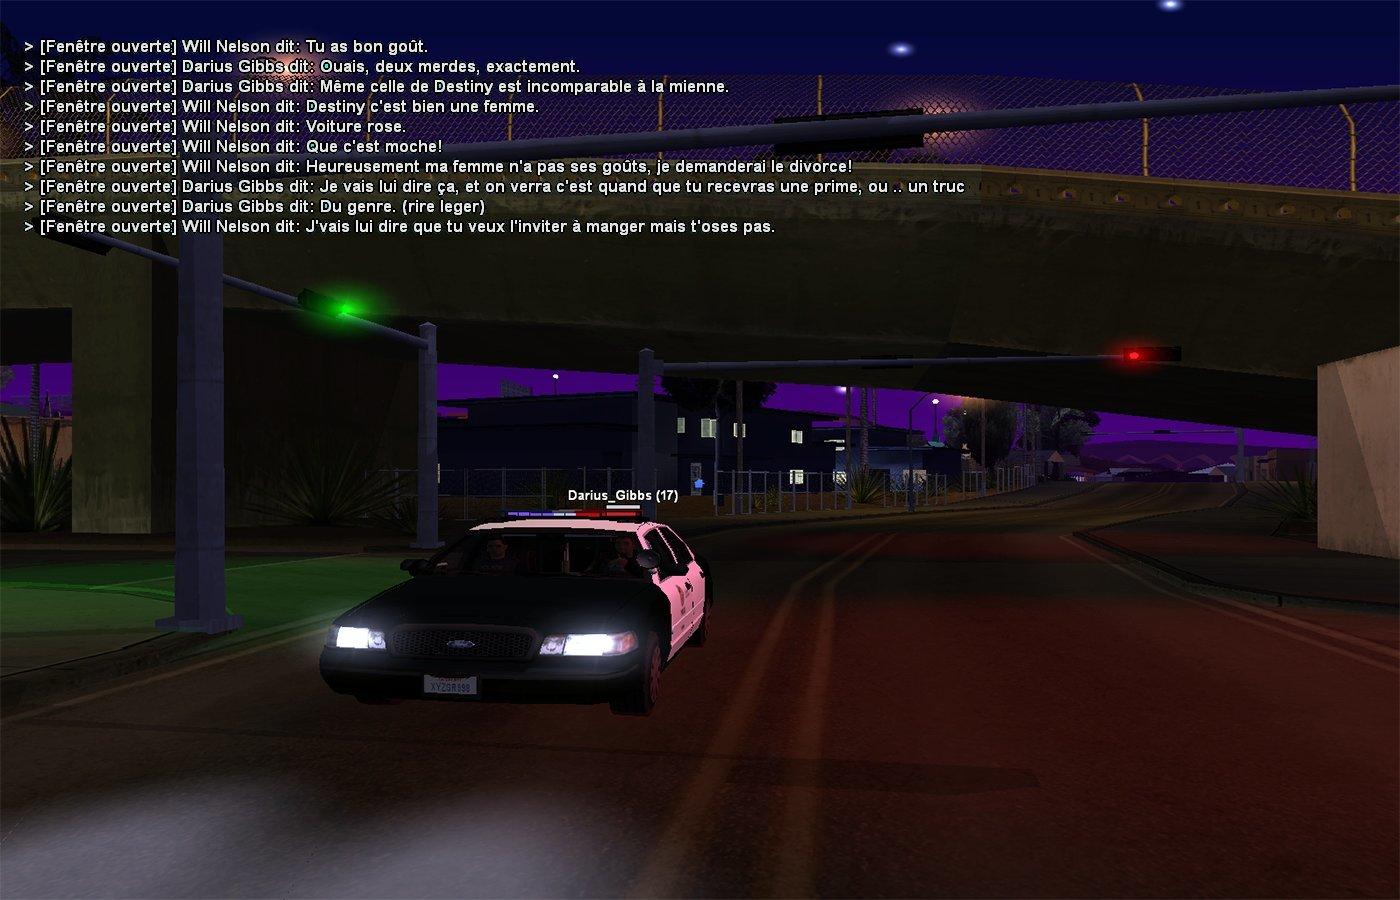 Los Santos Police Département #toprotectandtoserve (Part VI) - Page 3 1604274875-screen2